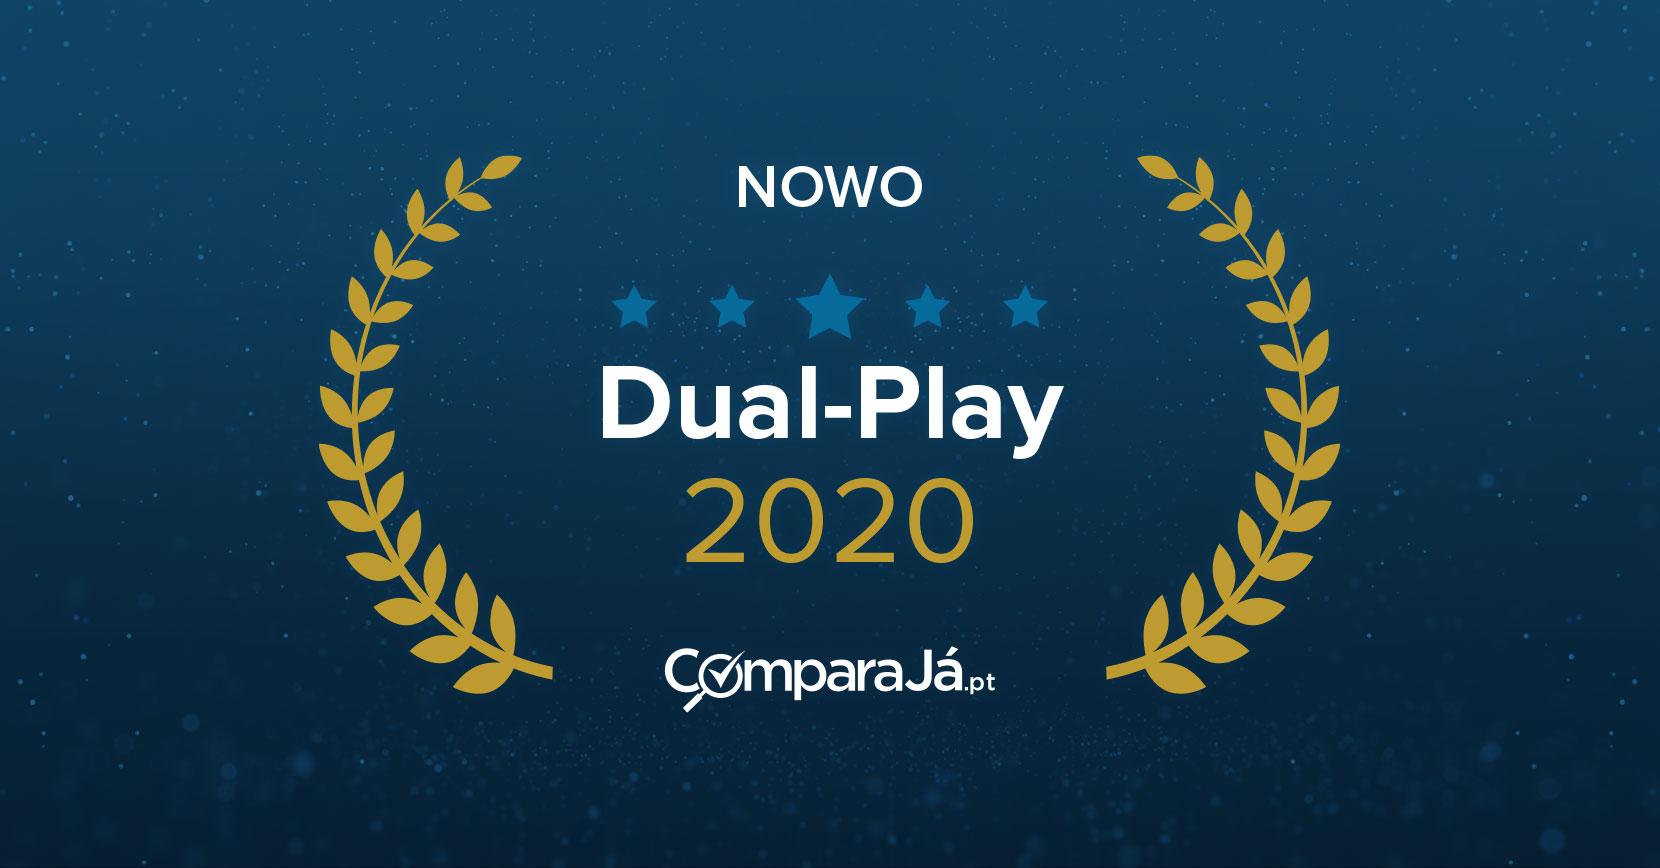 Prémio Dual Play 2020_NOWO